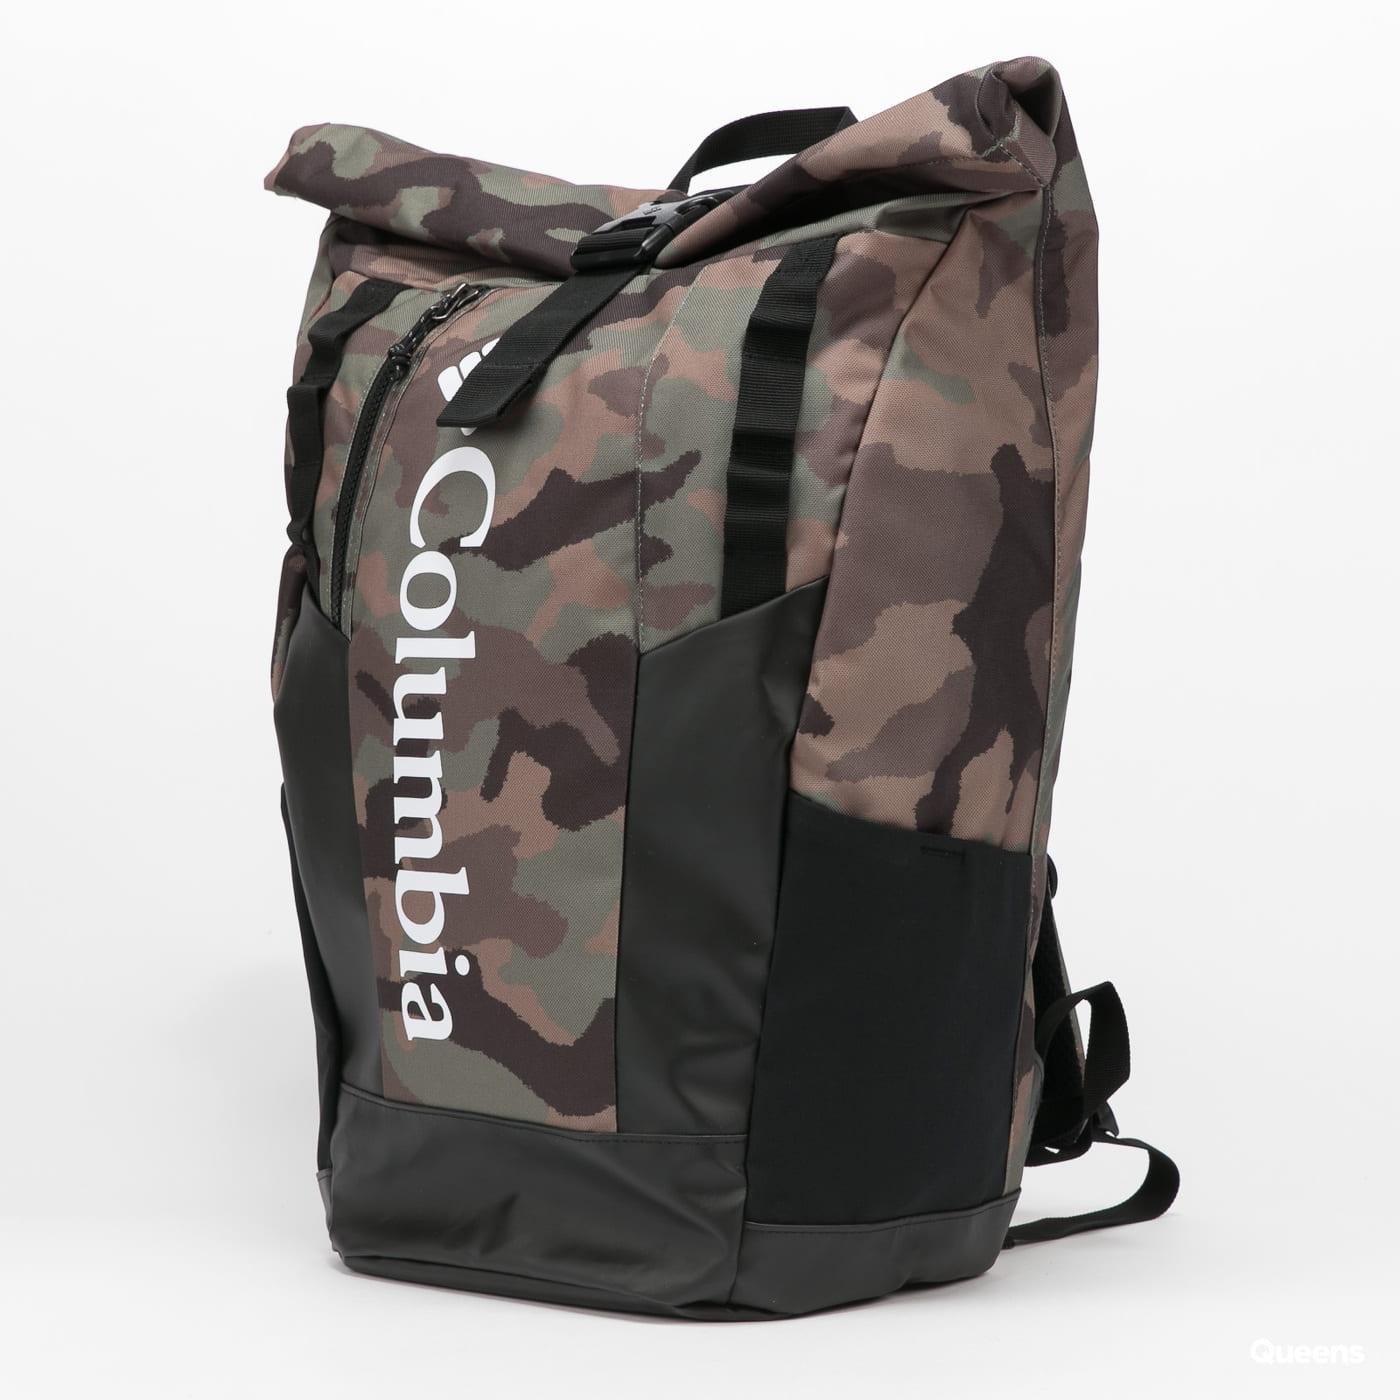 Columbia Convey 25L Rolltop Daypack camo zelený / černý